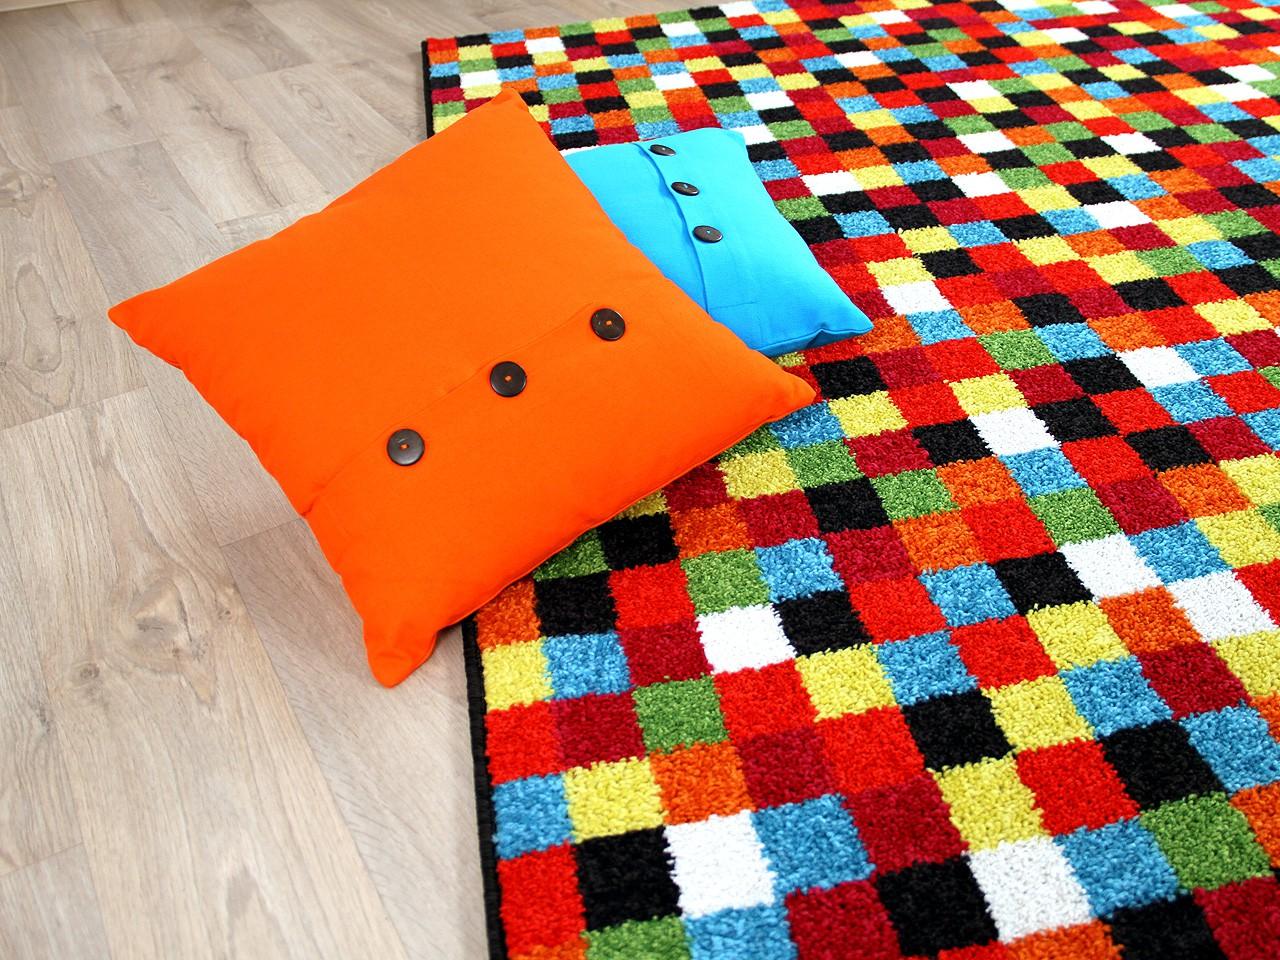 Designer Teppich Funky Pixel Rot Teppiche Designerteppiche